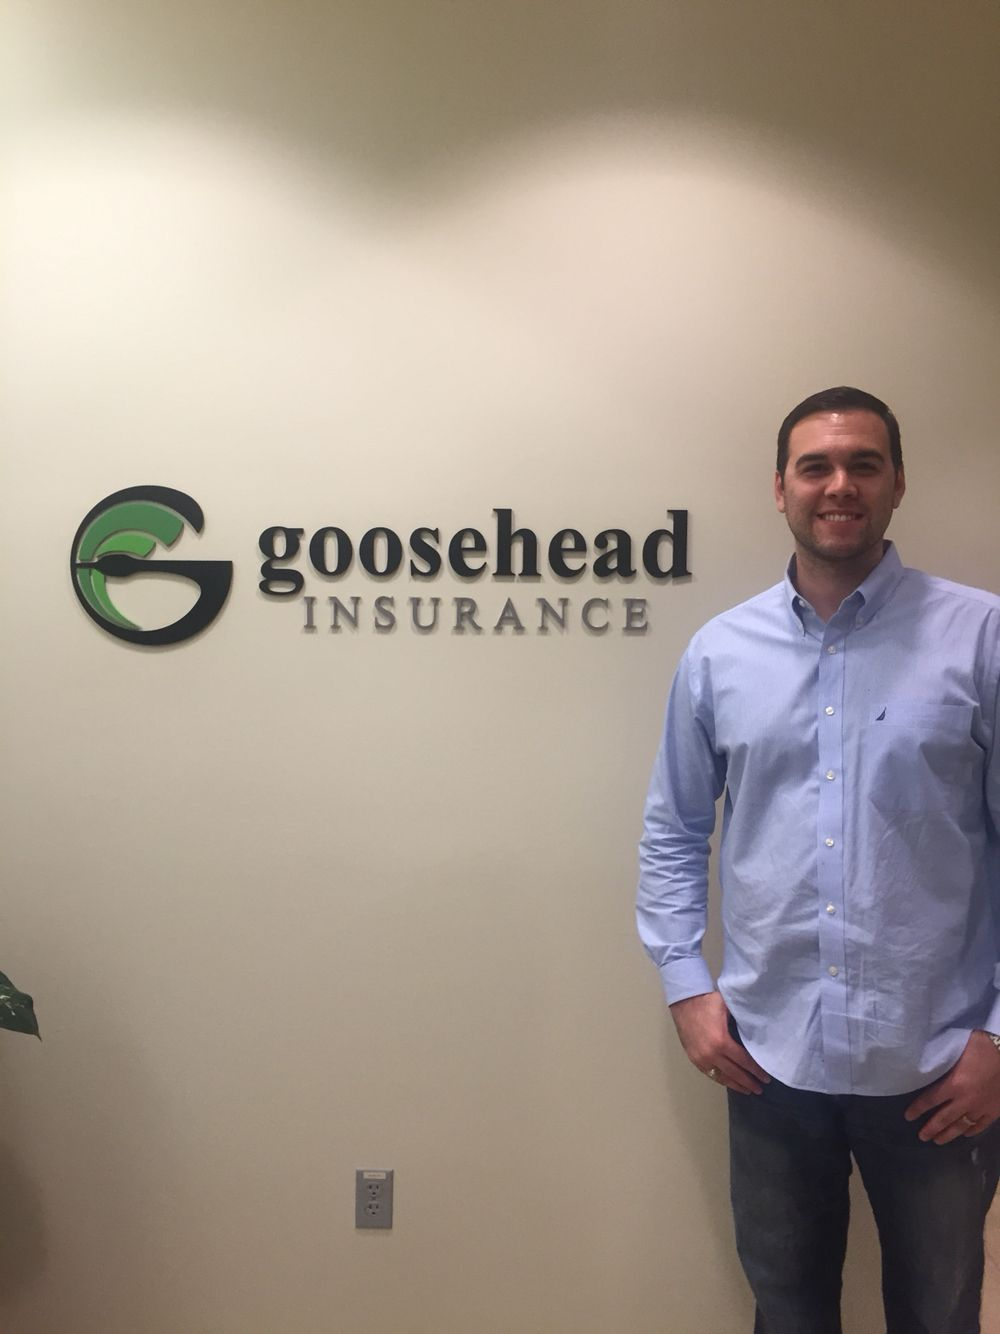 Goosehead Insurance Insurance Chef Jackets Shopping